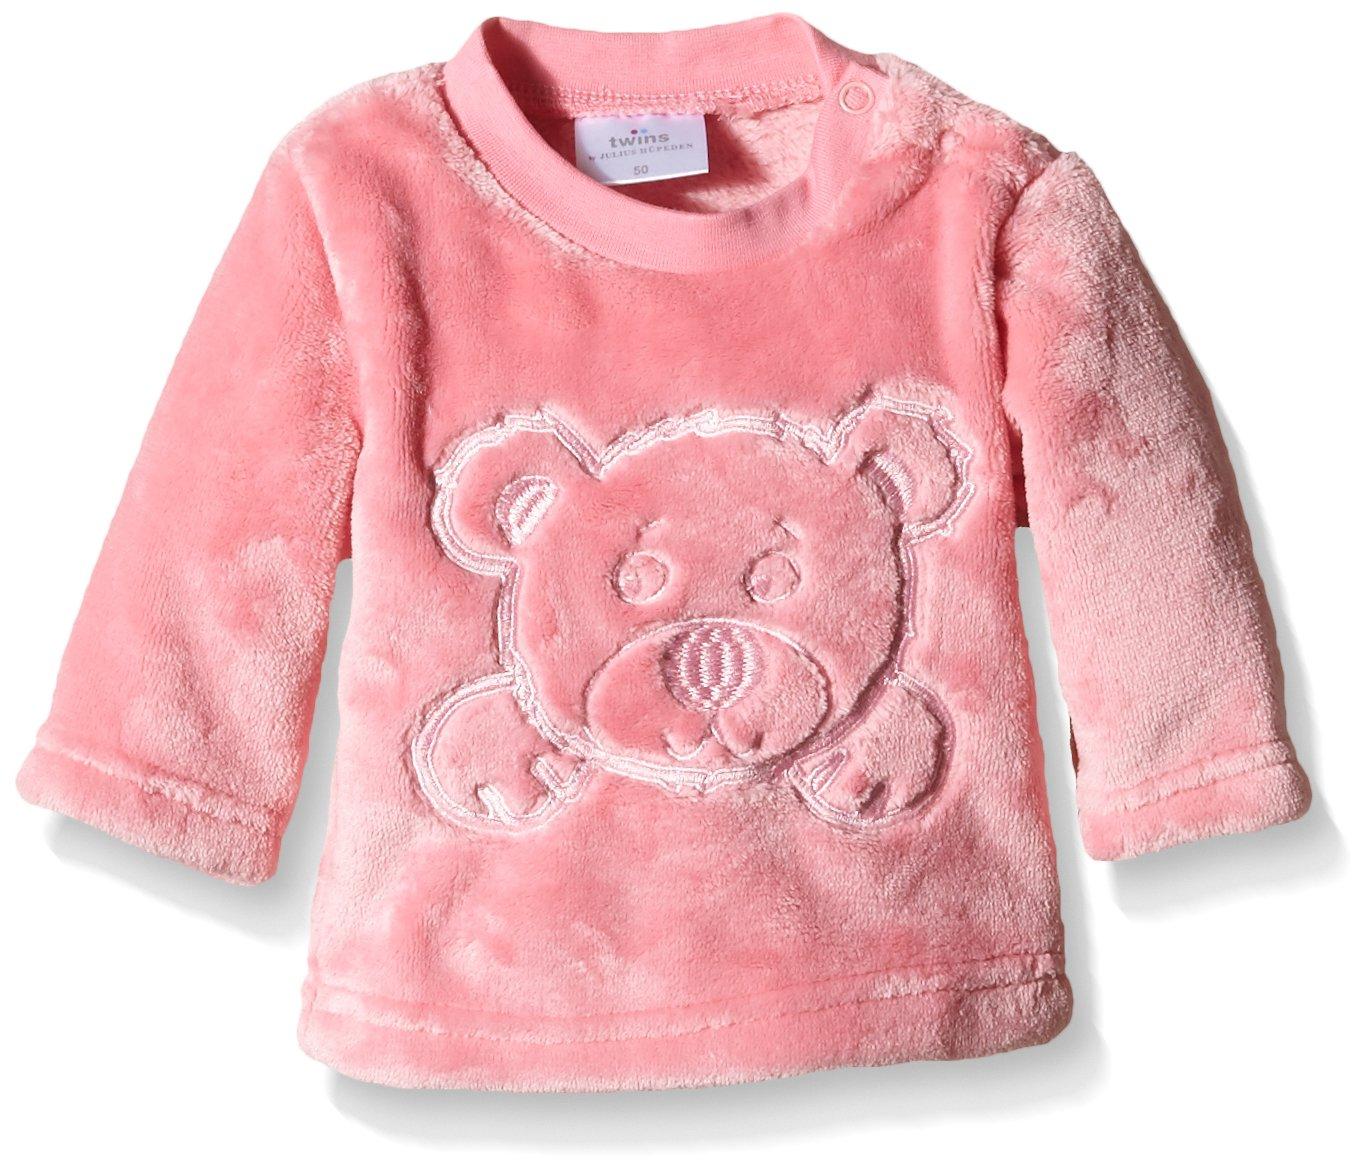 Twins In Fleece - suéter Bebé-Niños